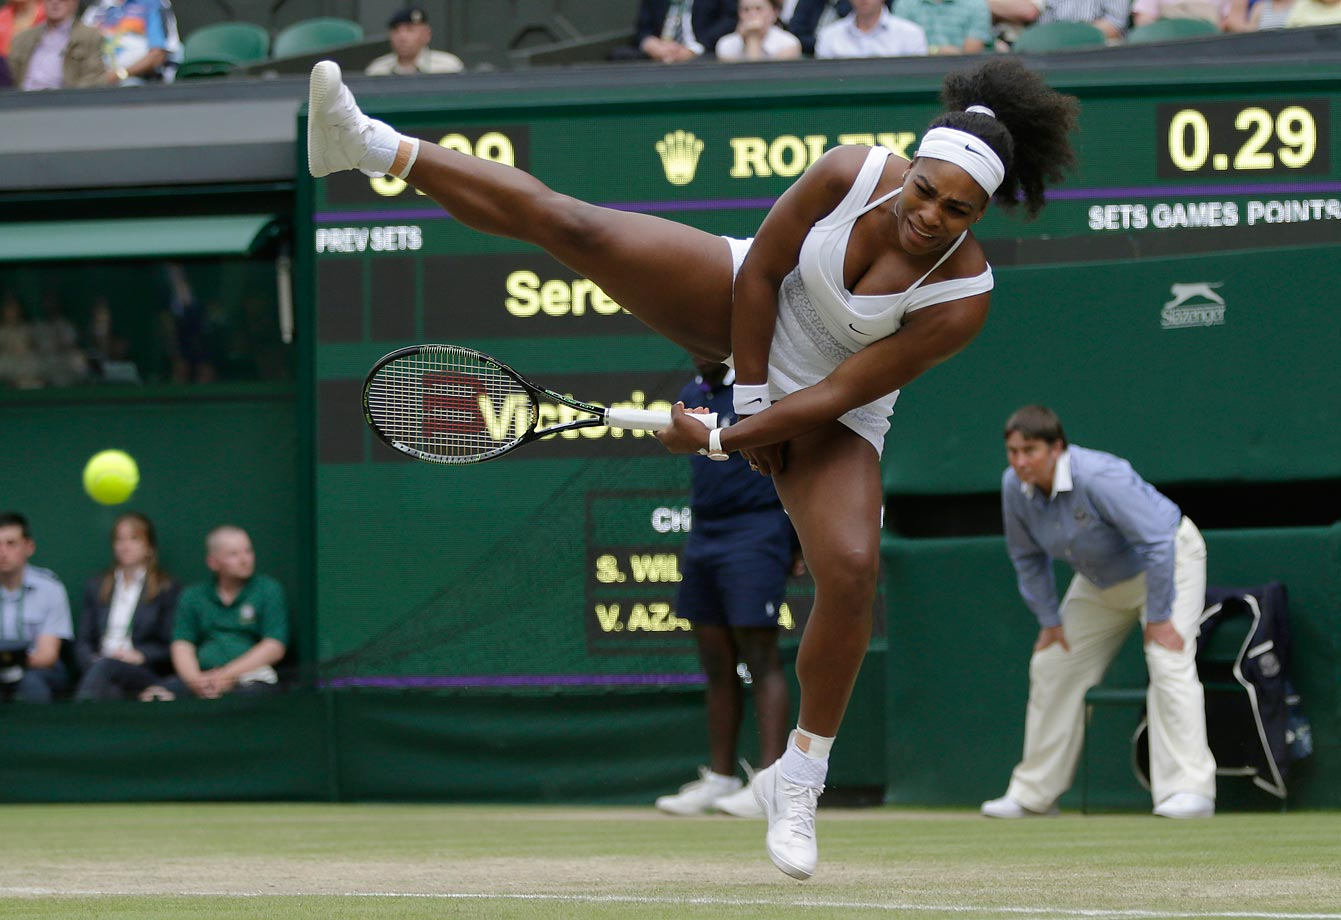 Serena Williams makes a funny return to Victoria Azarenka at Wimbledon.